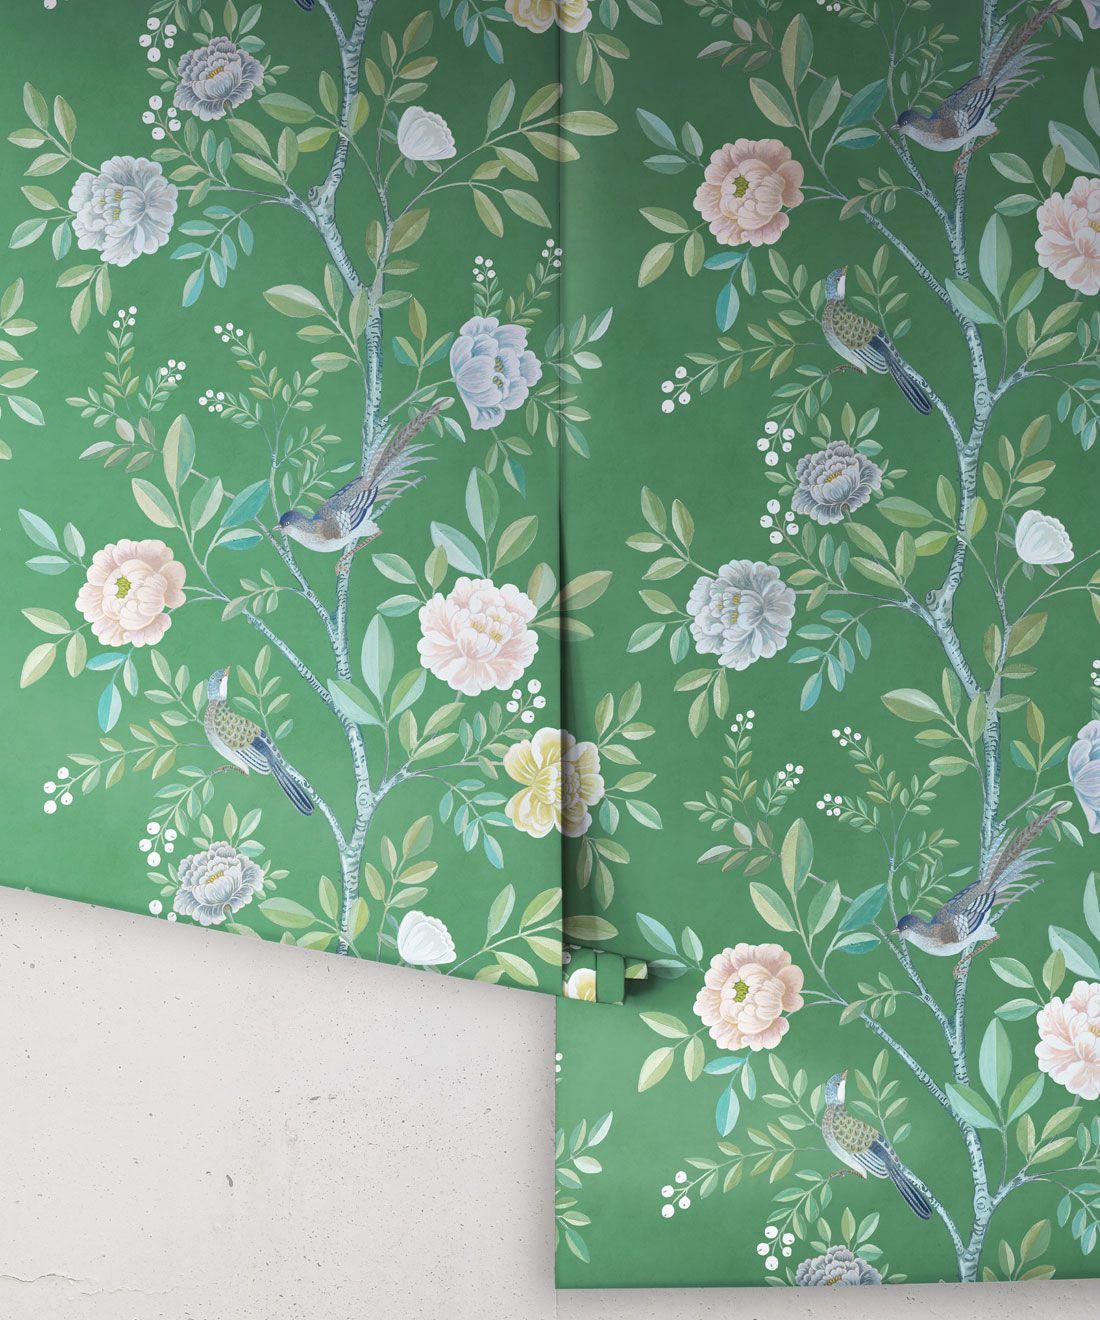 Chinoiserie Wallpaper •Floral Wallpaper •Bird Wallpaper • Magnolia • Forest Green • Rolls